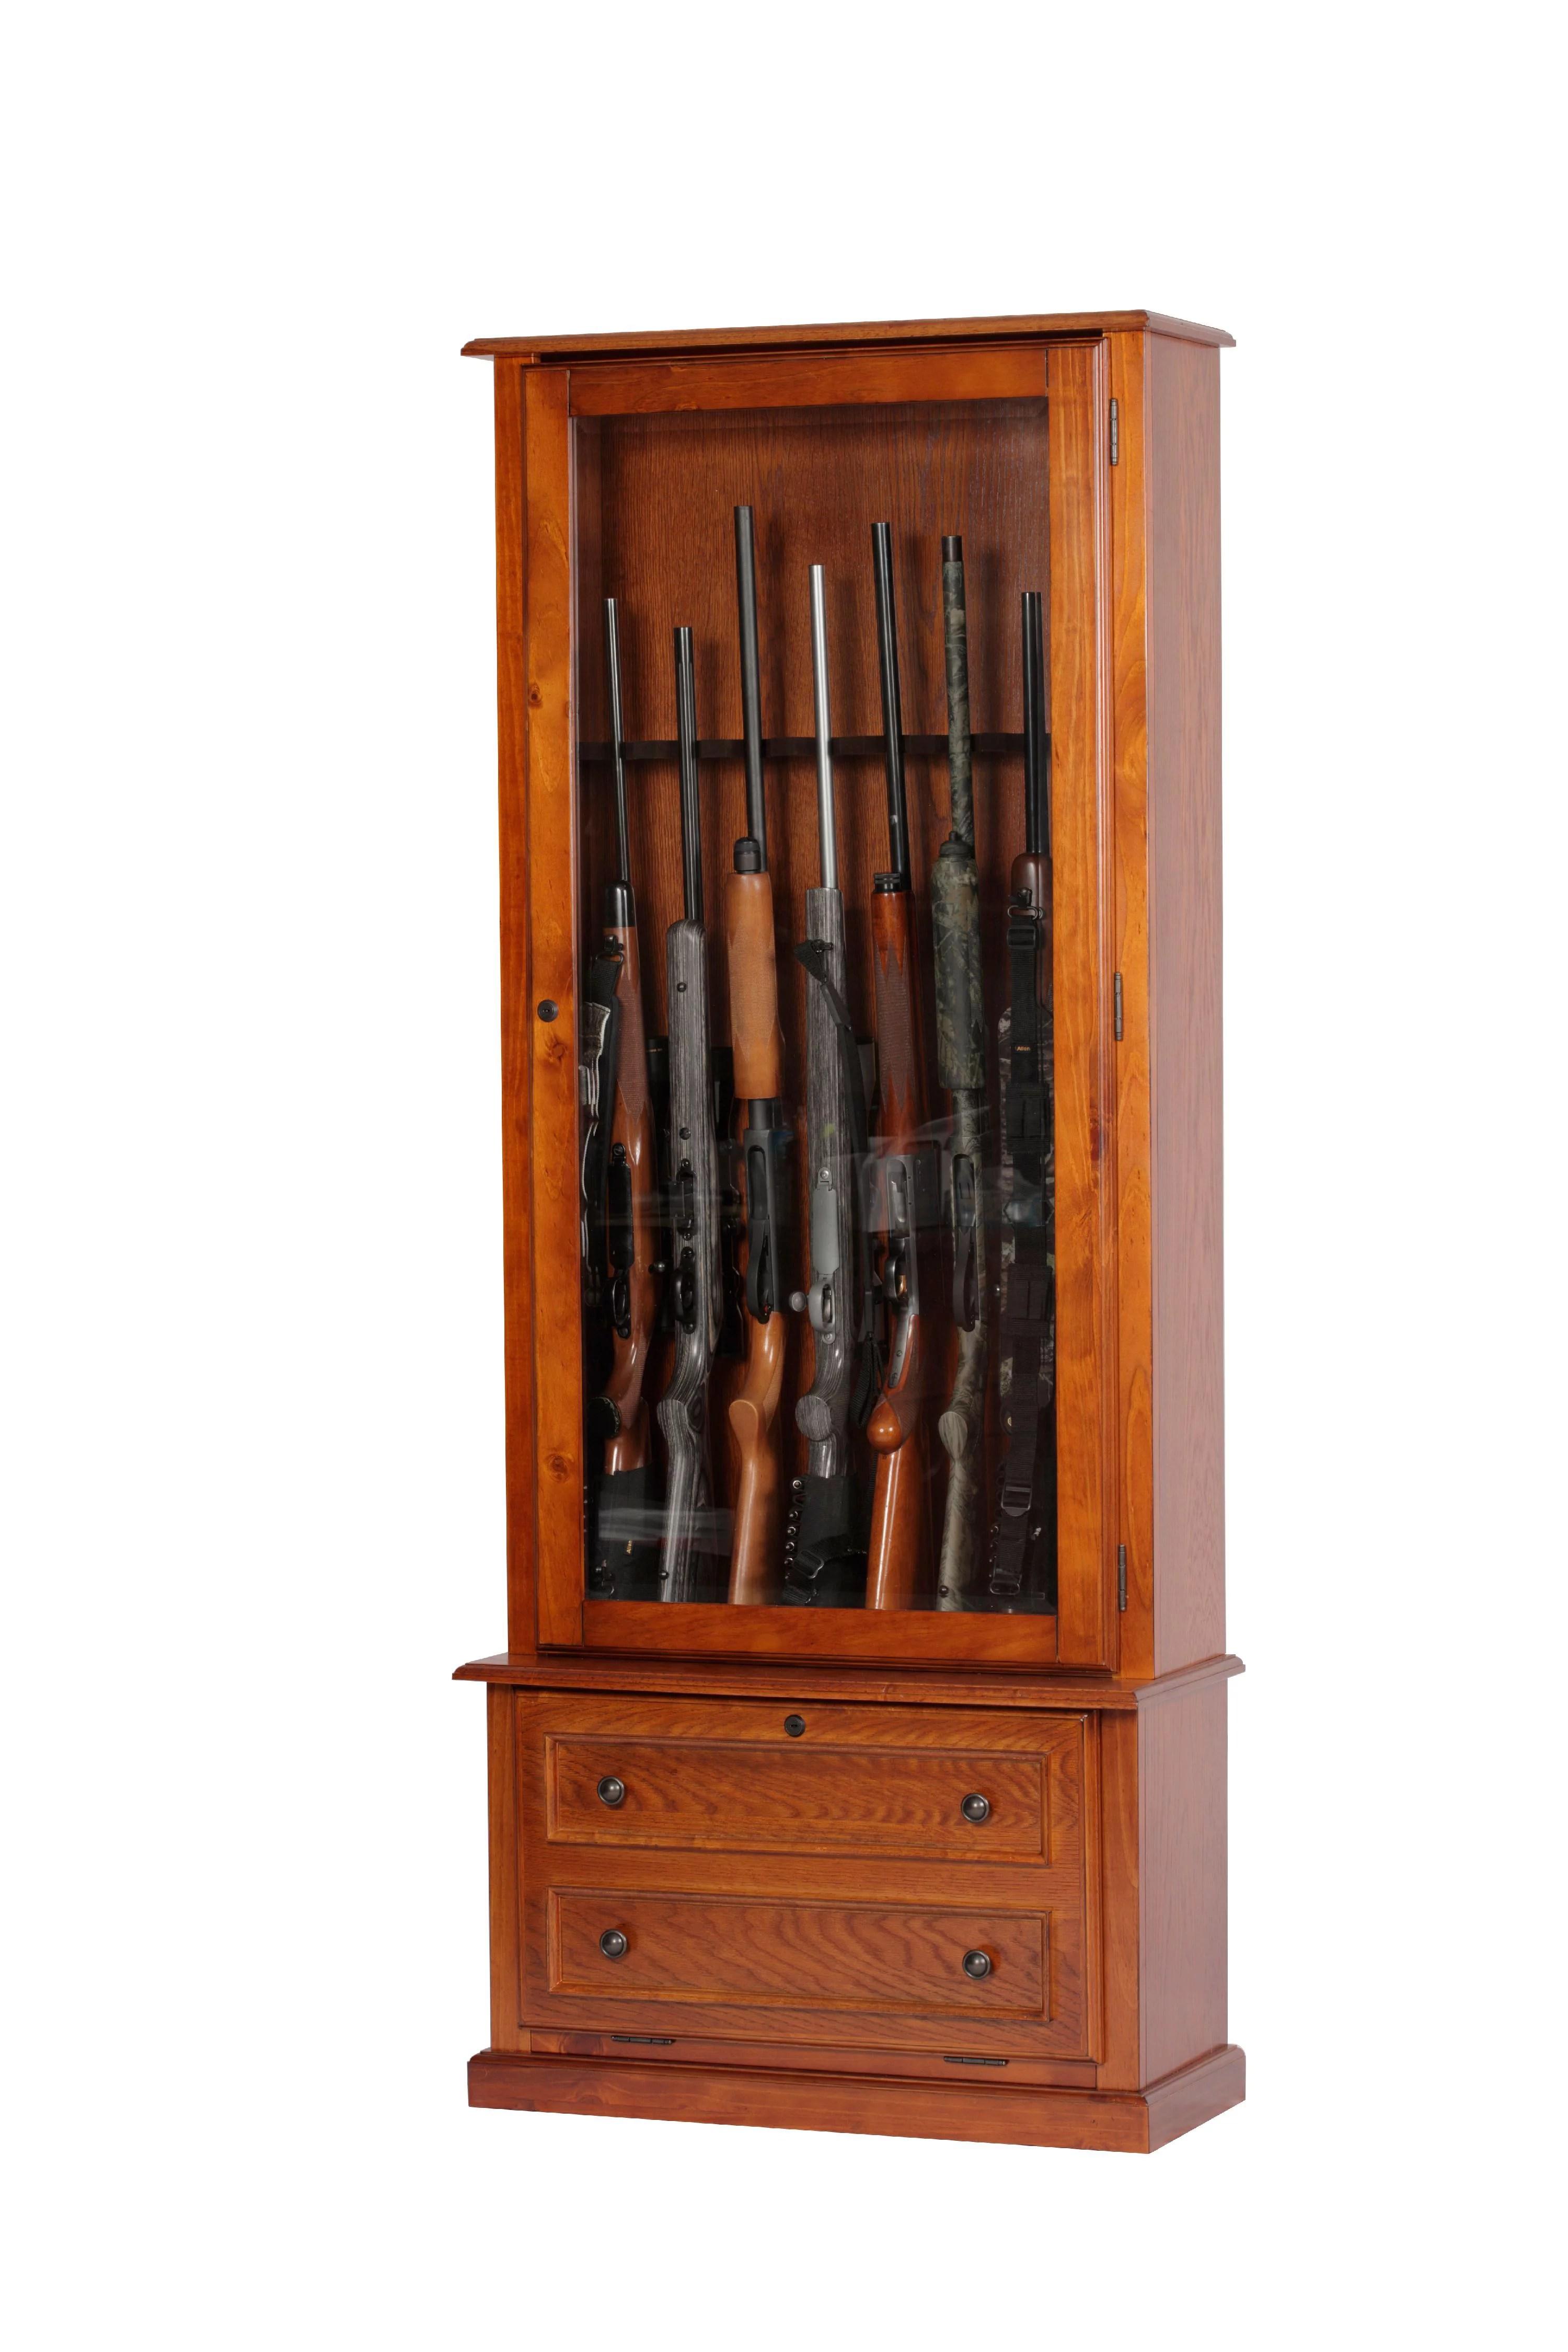 8 Gun Classic Gun Cabinet